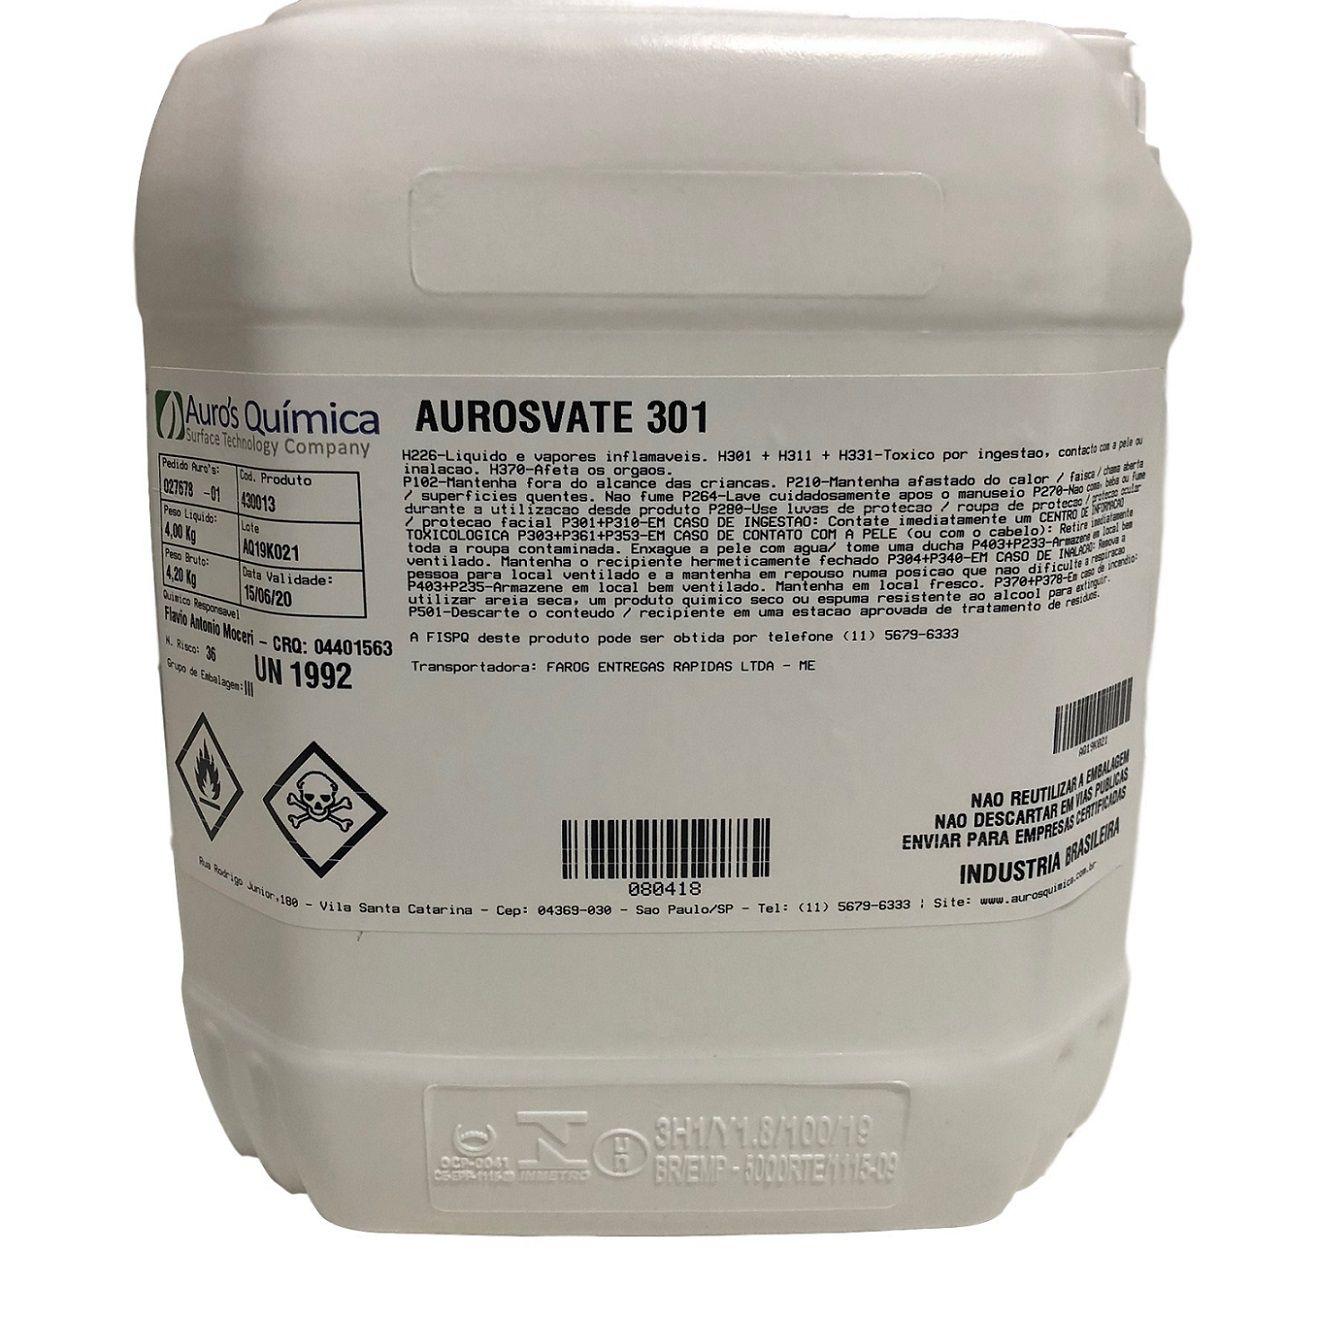 Álcool Metílico - 10 Litros (Metanol)